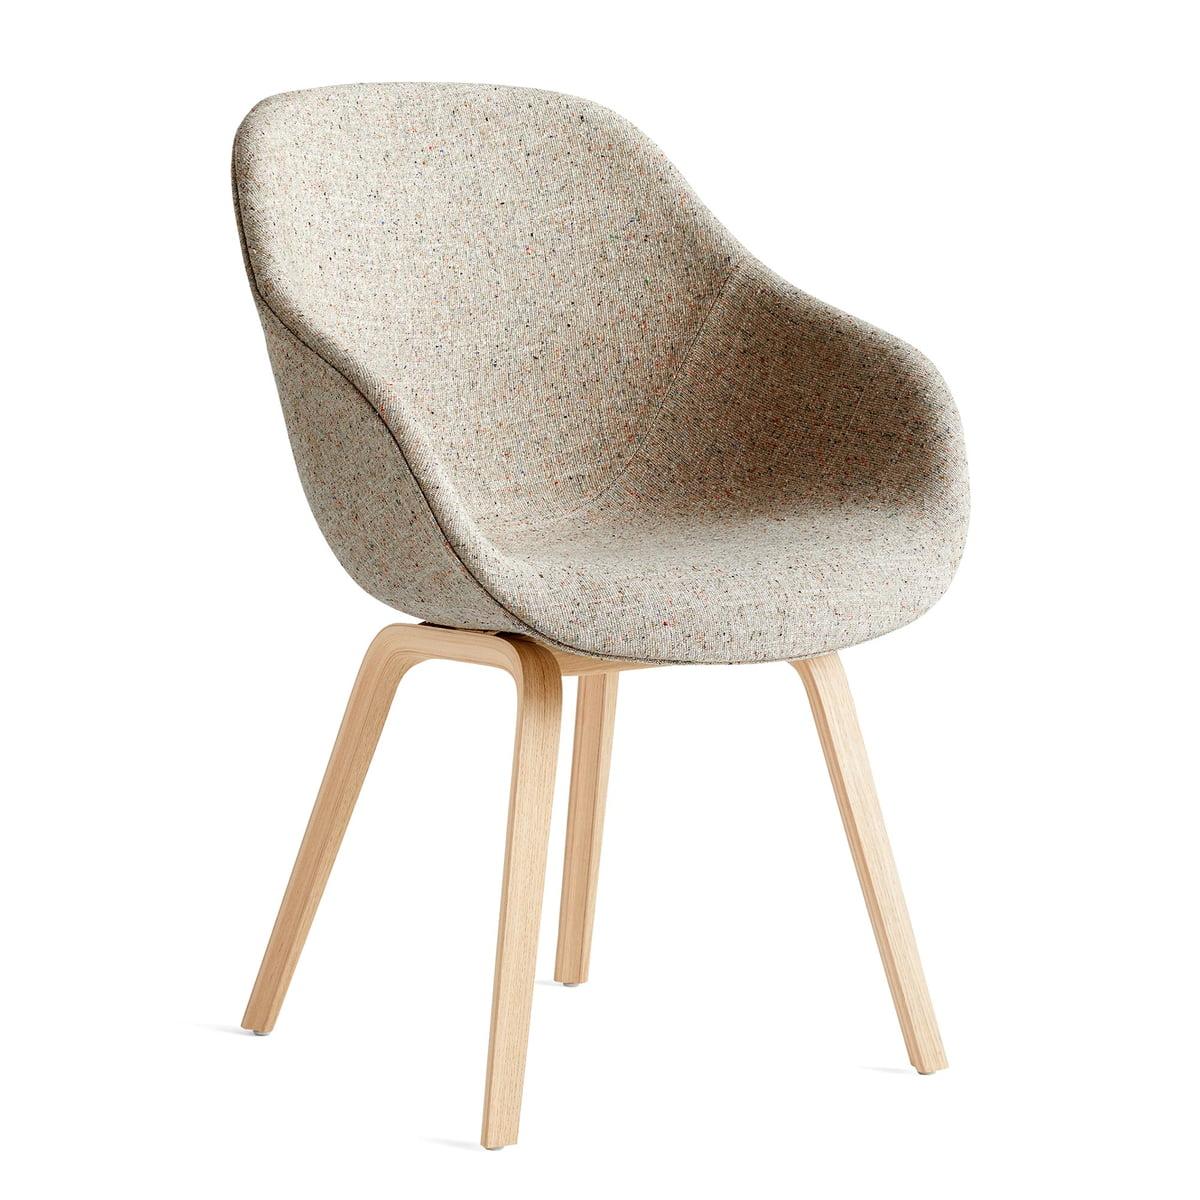 Hay   About a chair aac 12, matt lacquered oak / bolgheri lgg12